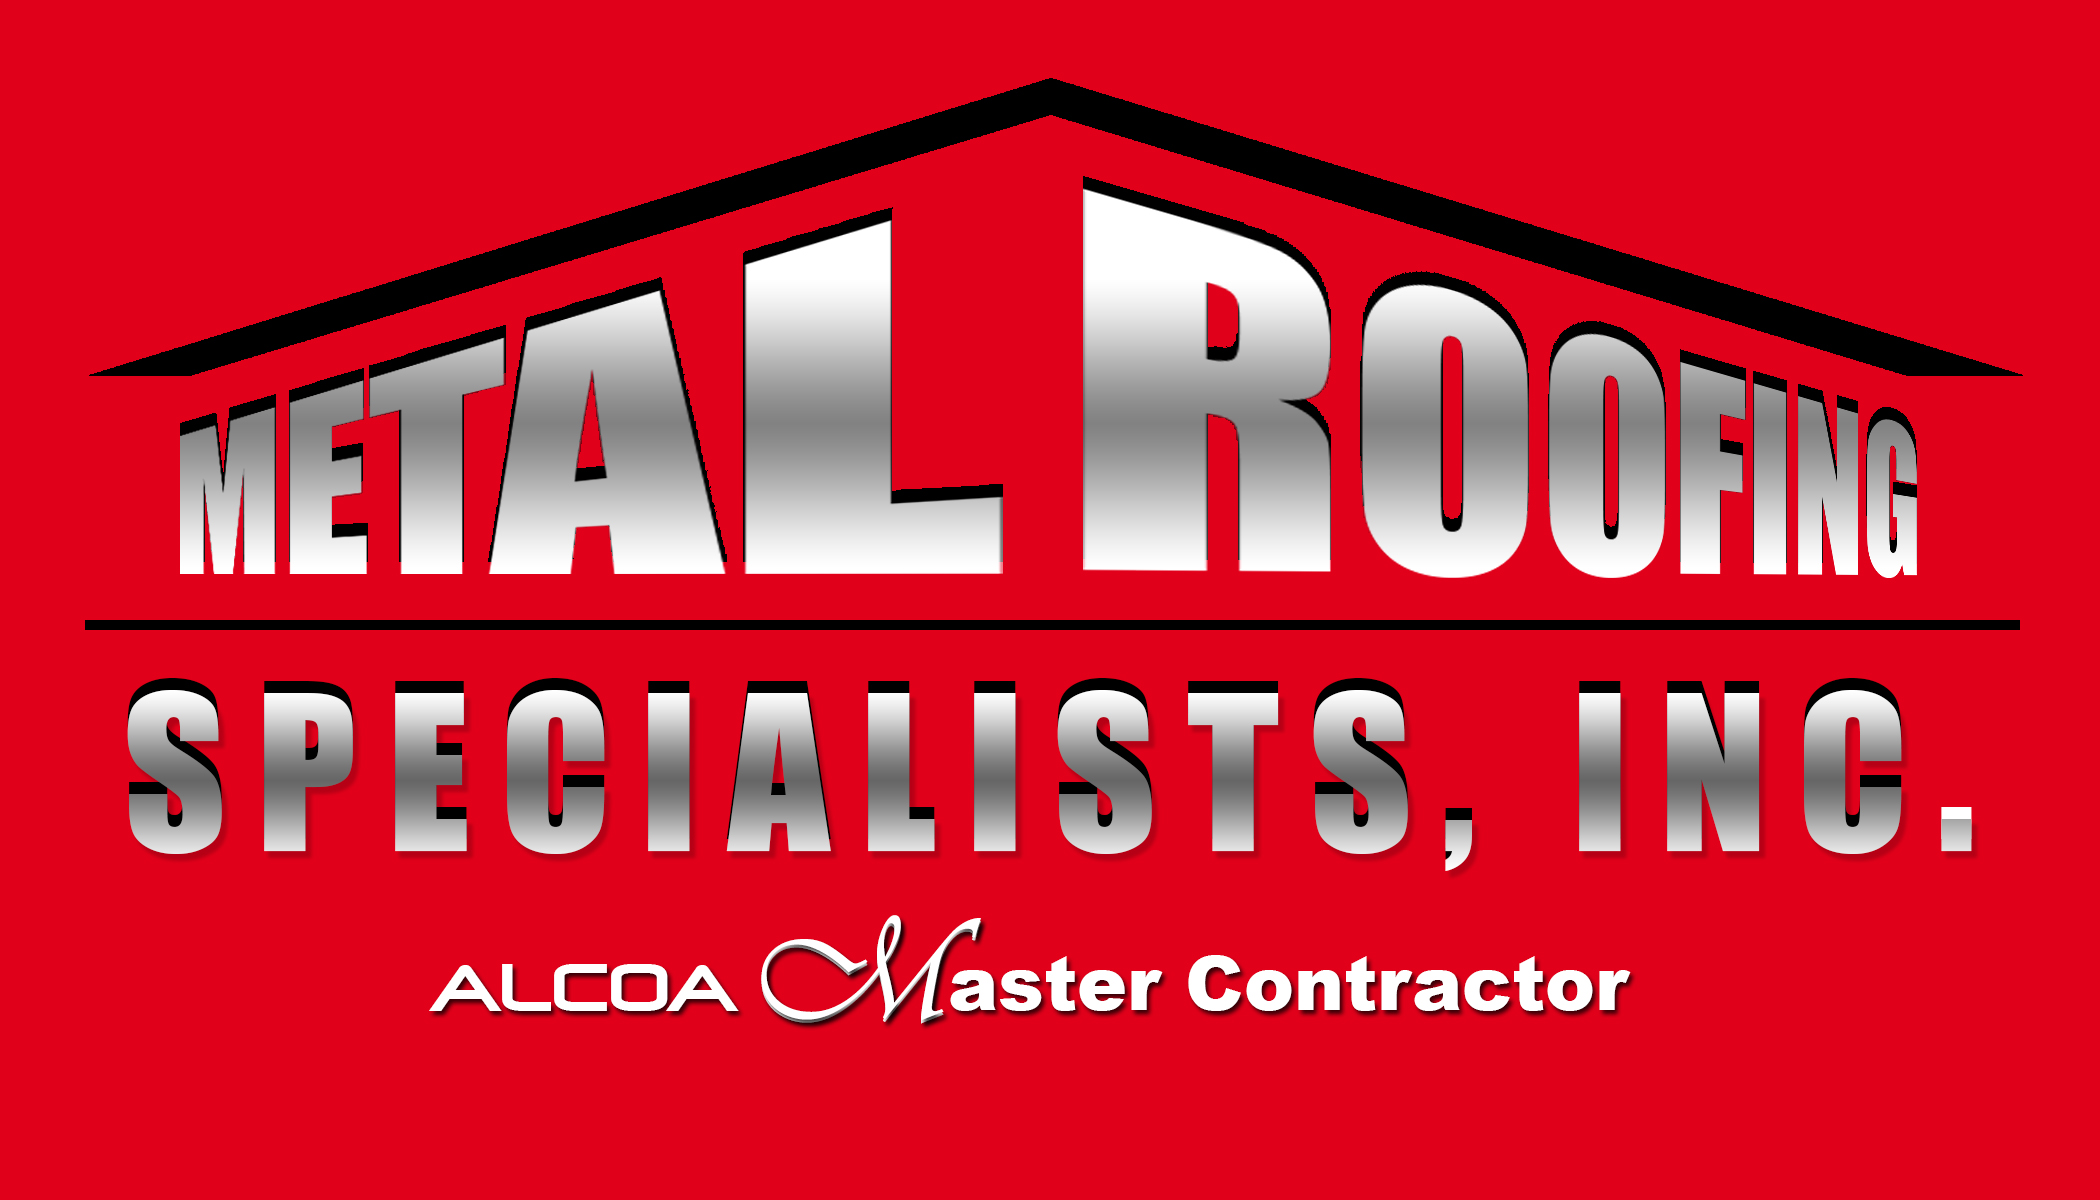 Aluminum Roofing Specialists, LLC